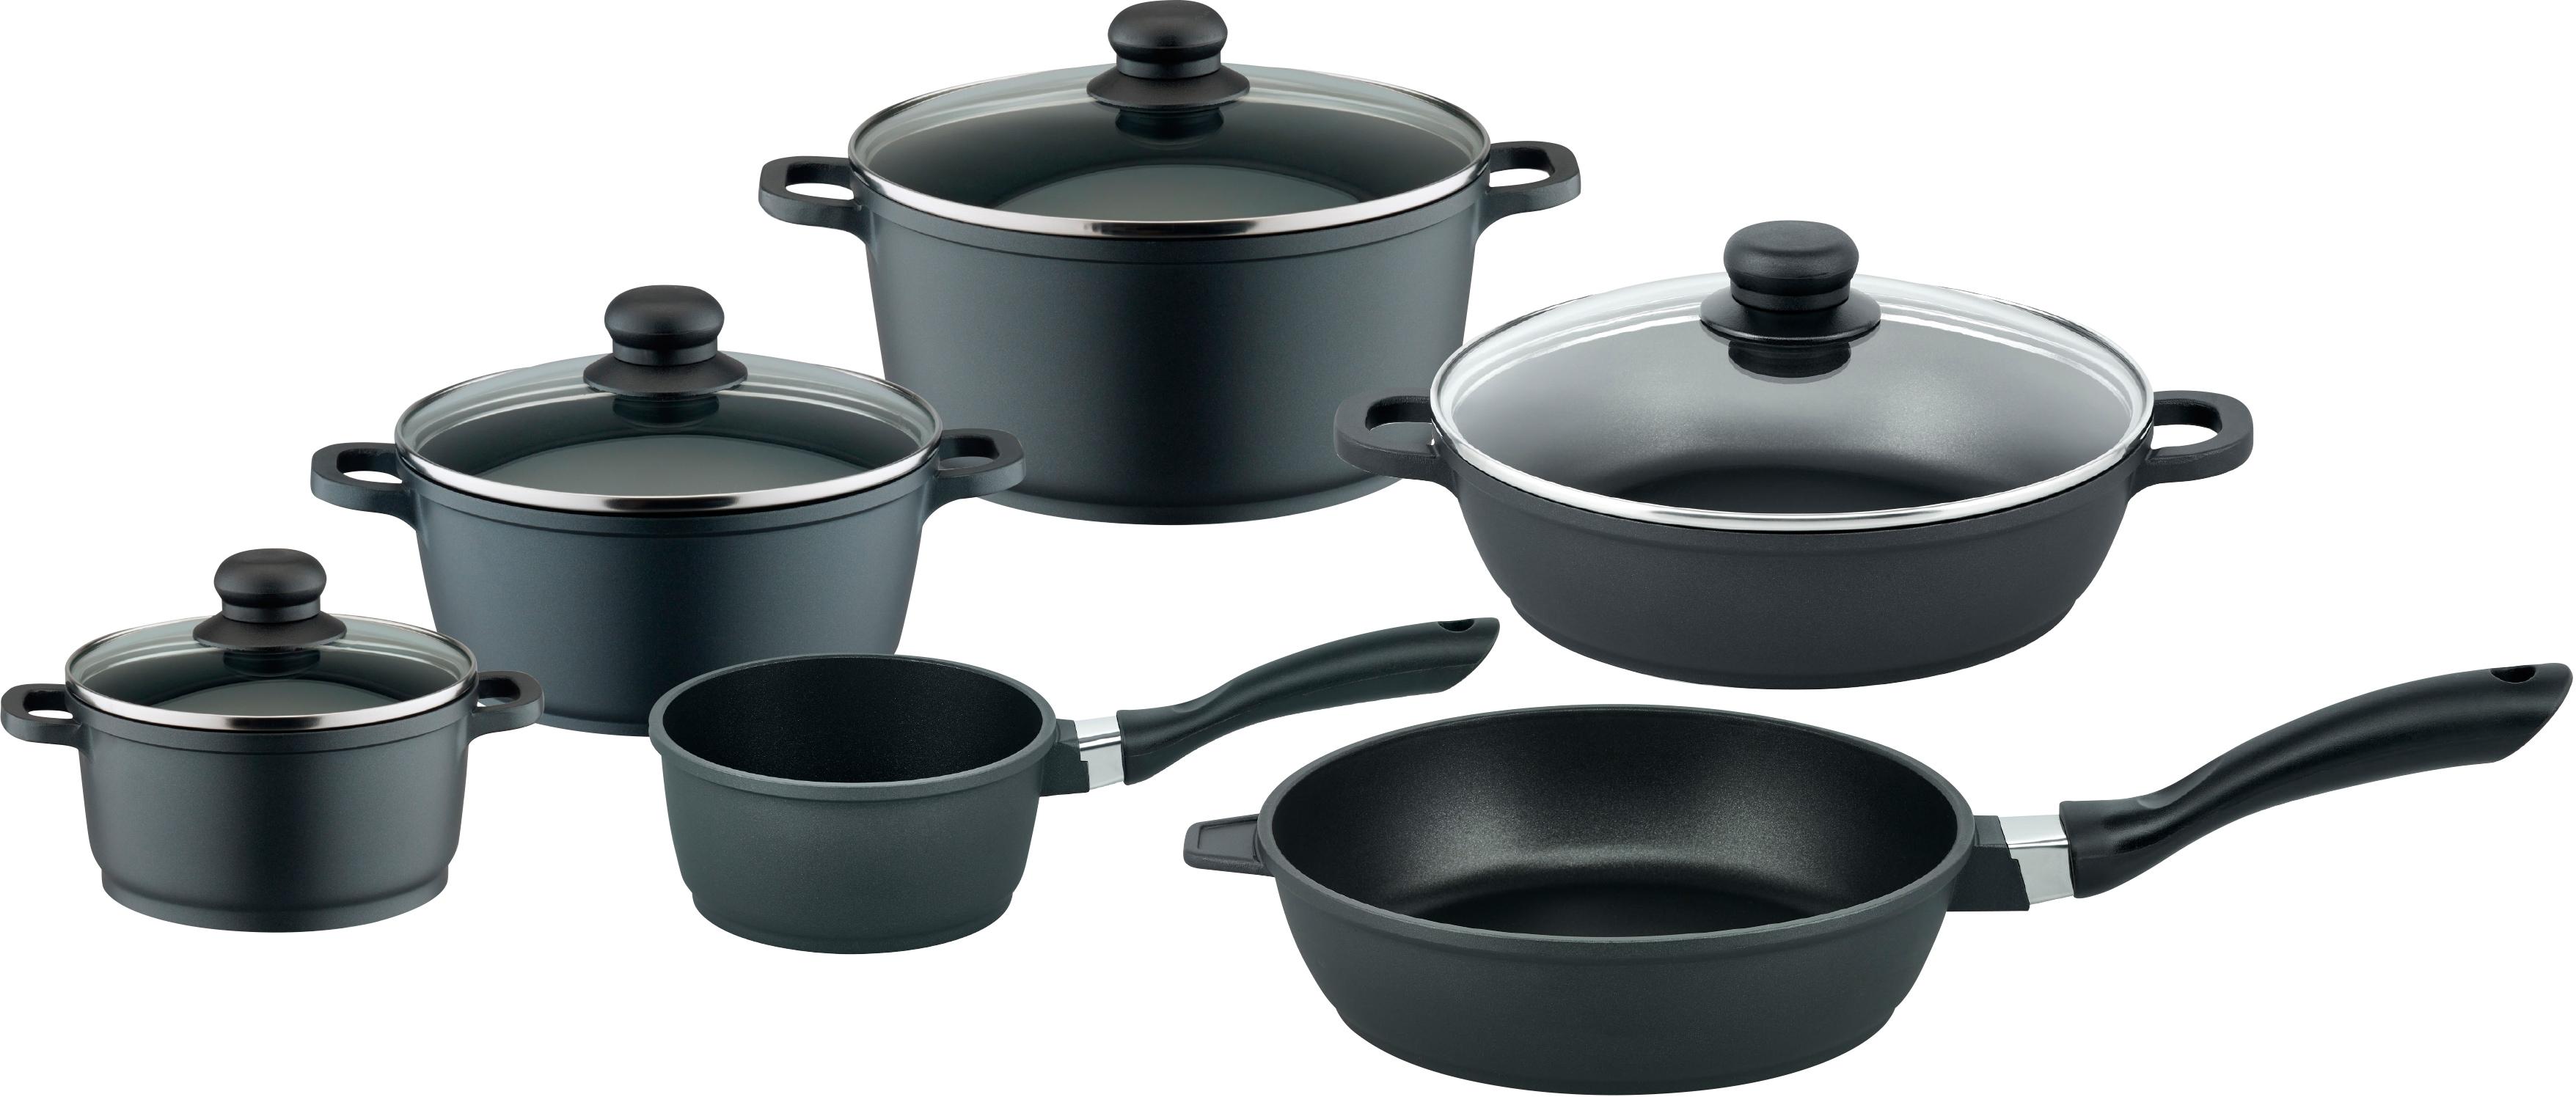 Elo - Basic Elo Basic Topf-Set Black Cast, Aluminiumguss, (Set, 10 tlg.), Induktion schwarz Topfsets Töpfe Haushaltswaren